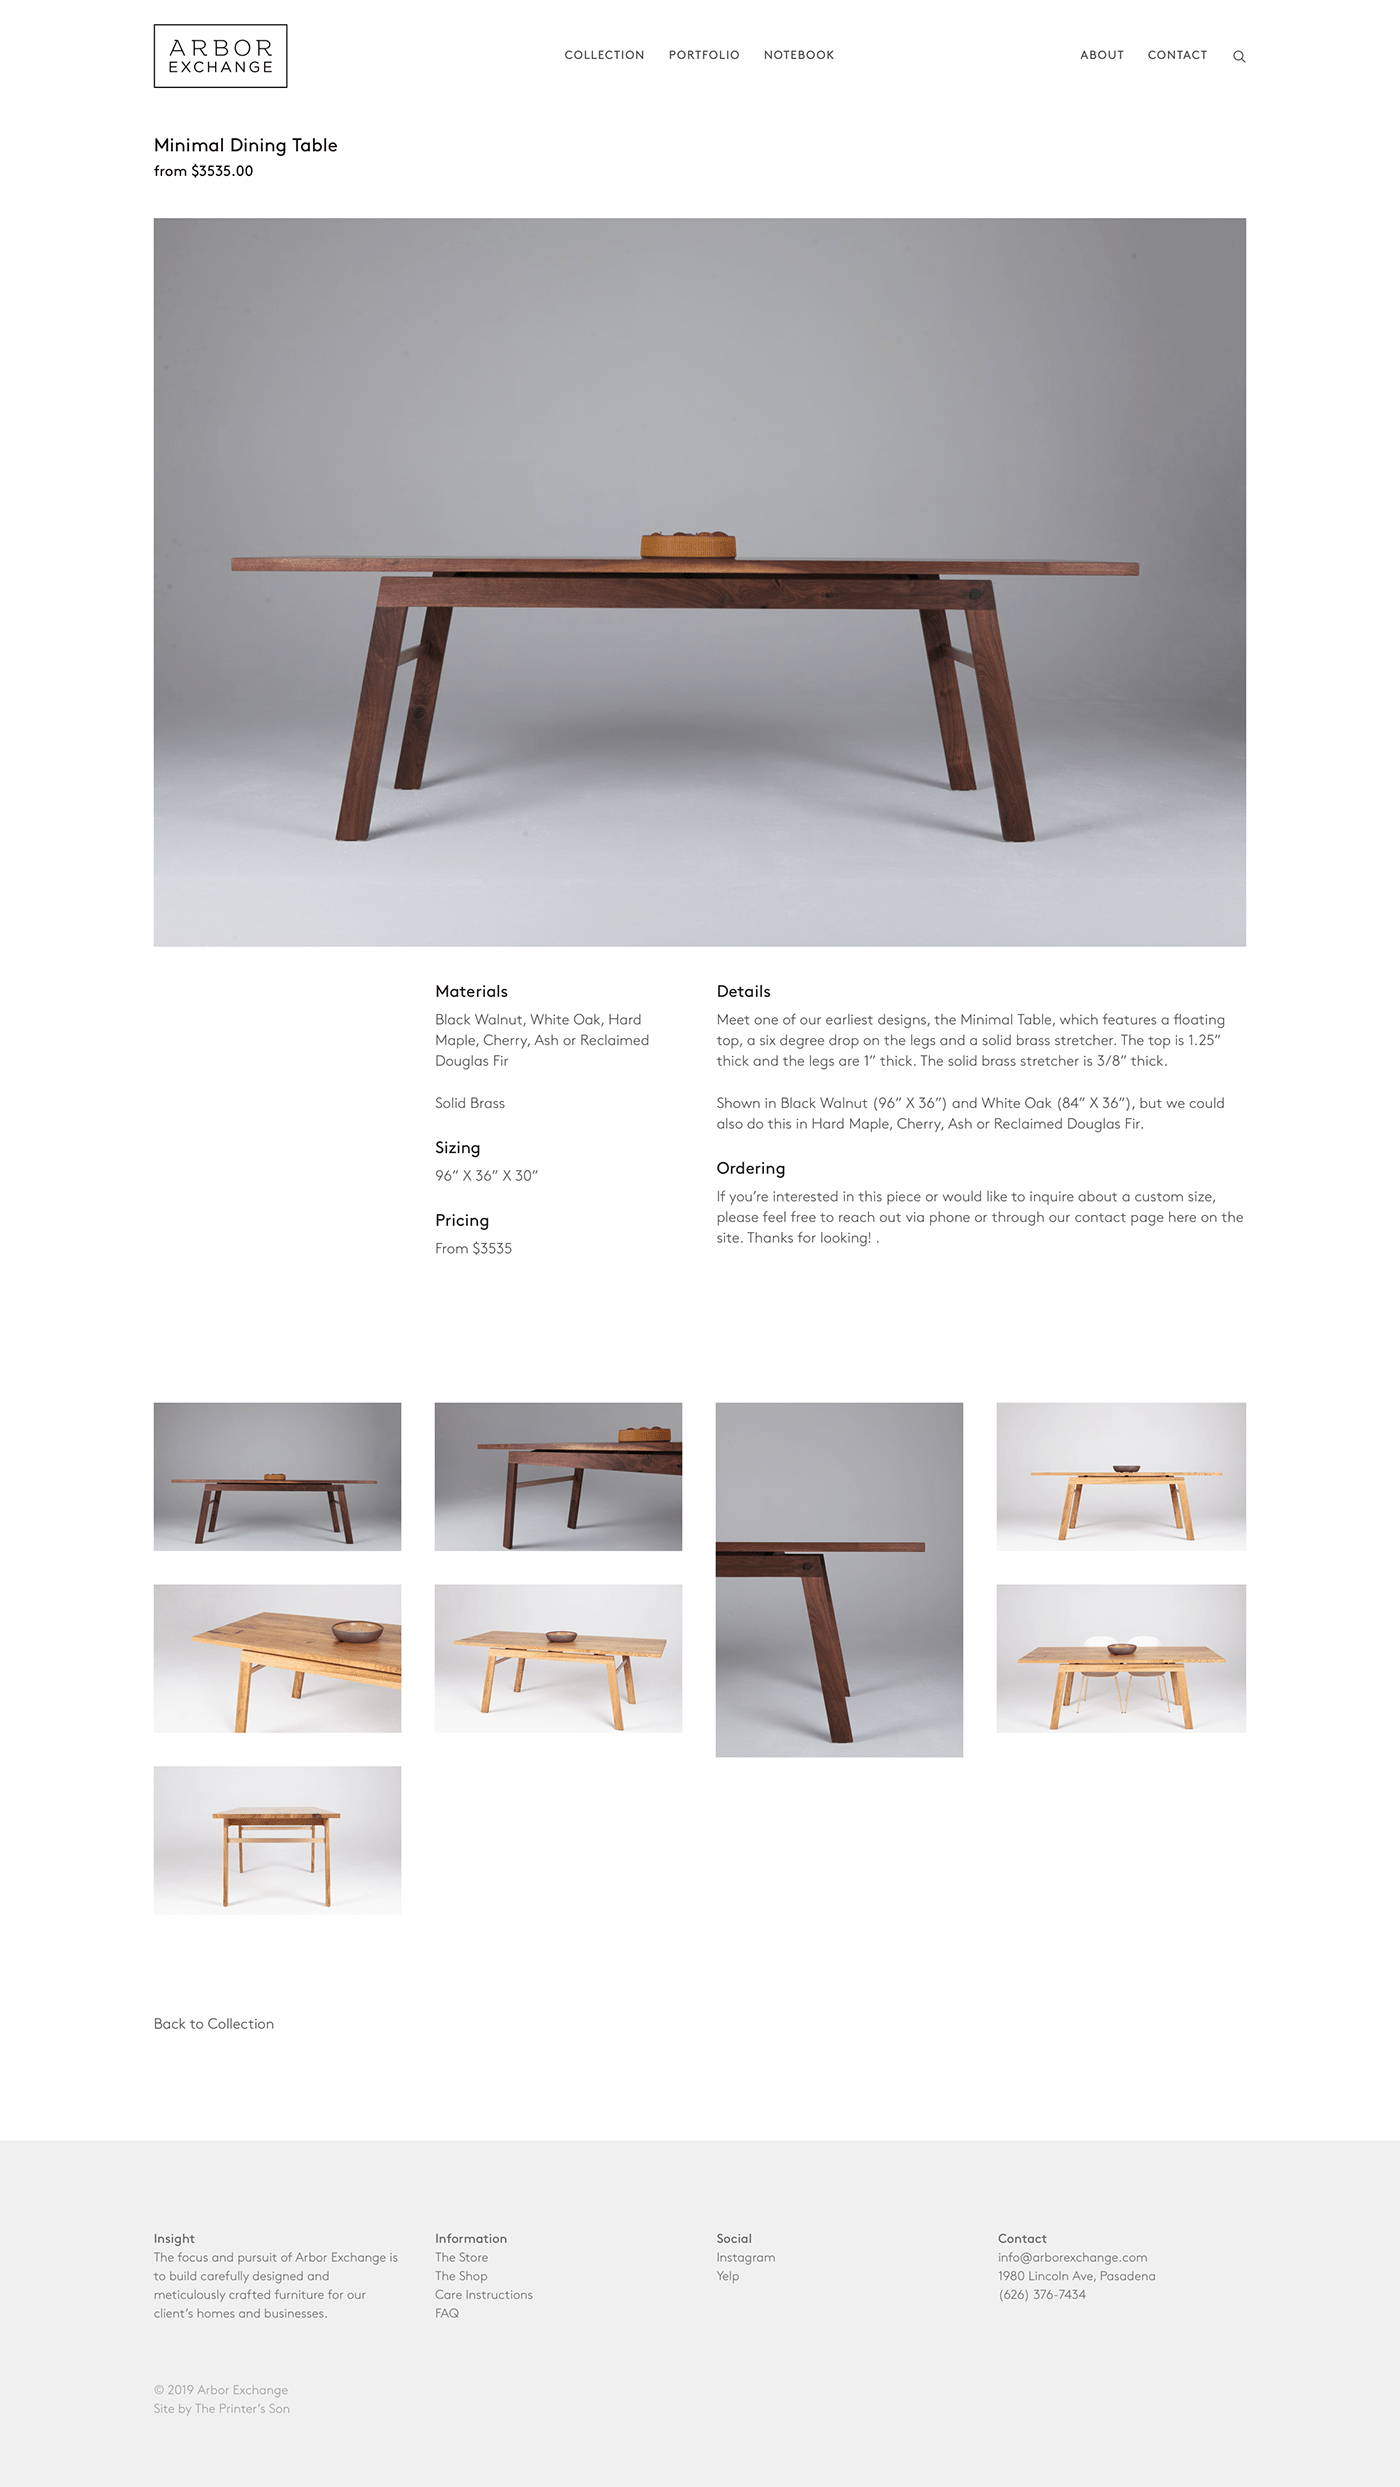 Arbor Exchange craftsmanship furniture design  grid based squarespace The Printer's Son Web Design